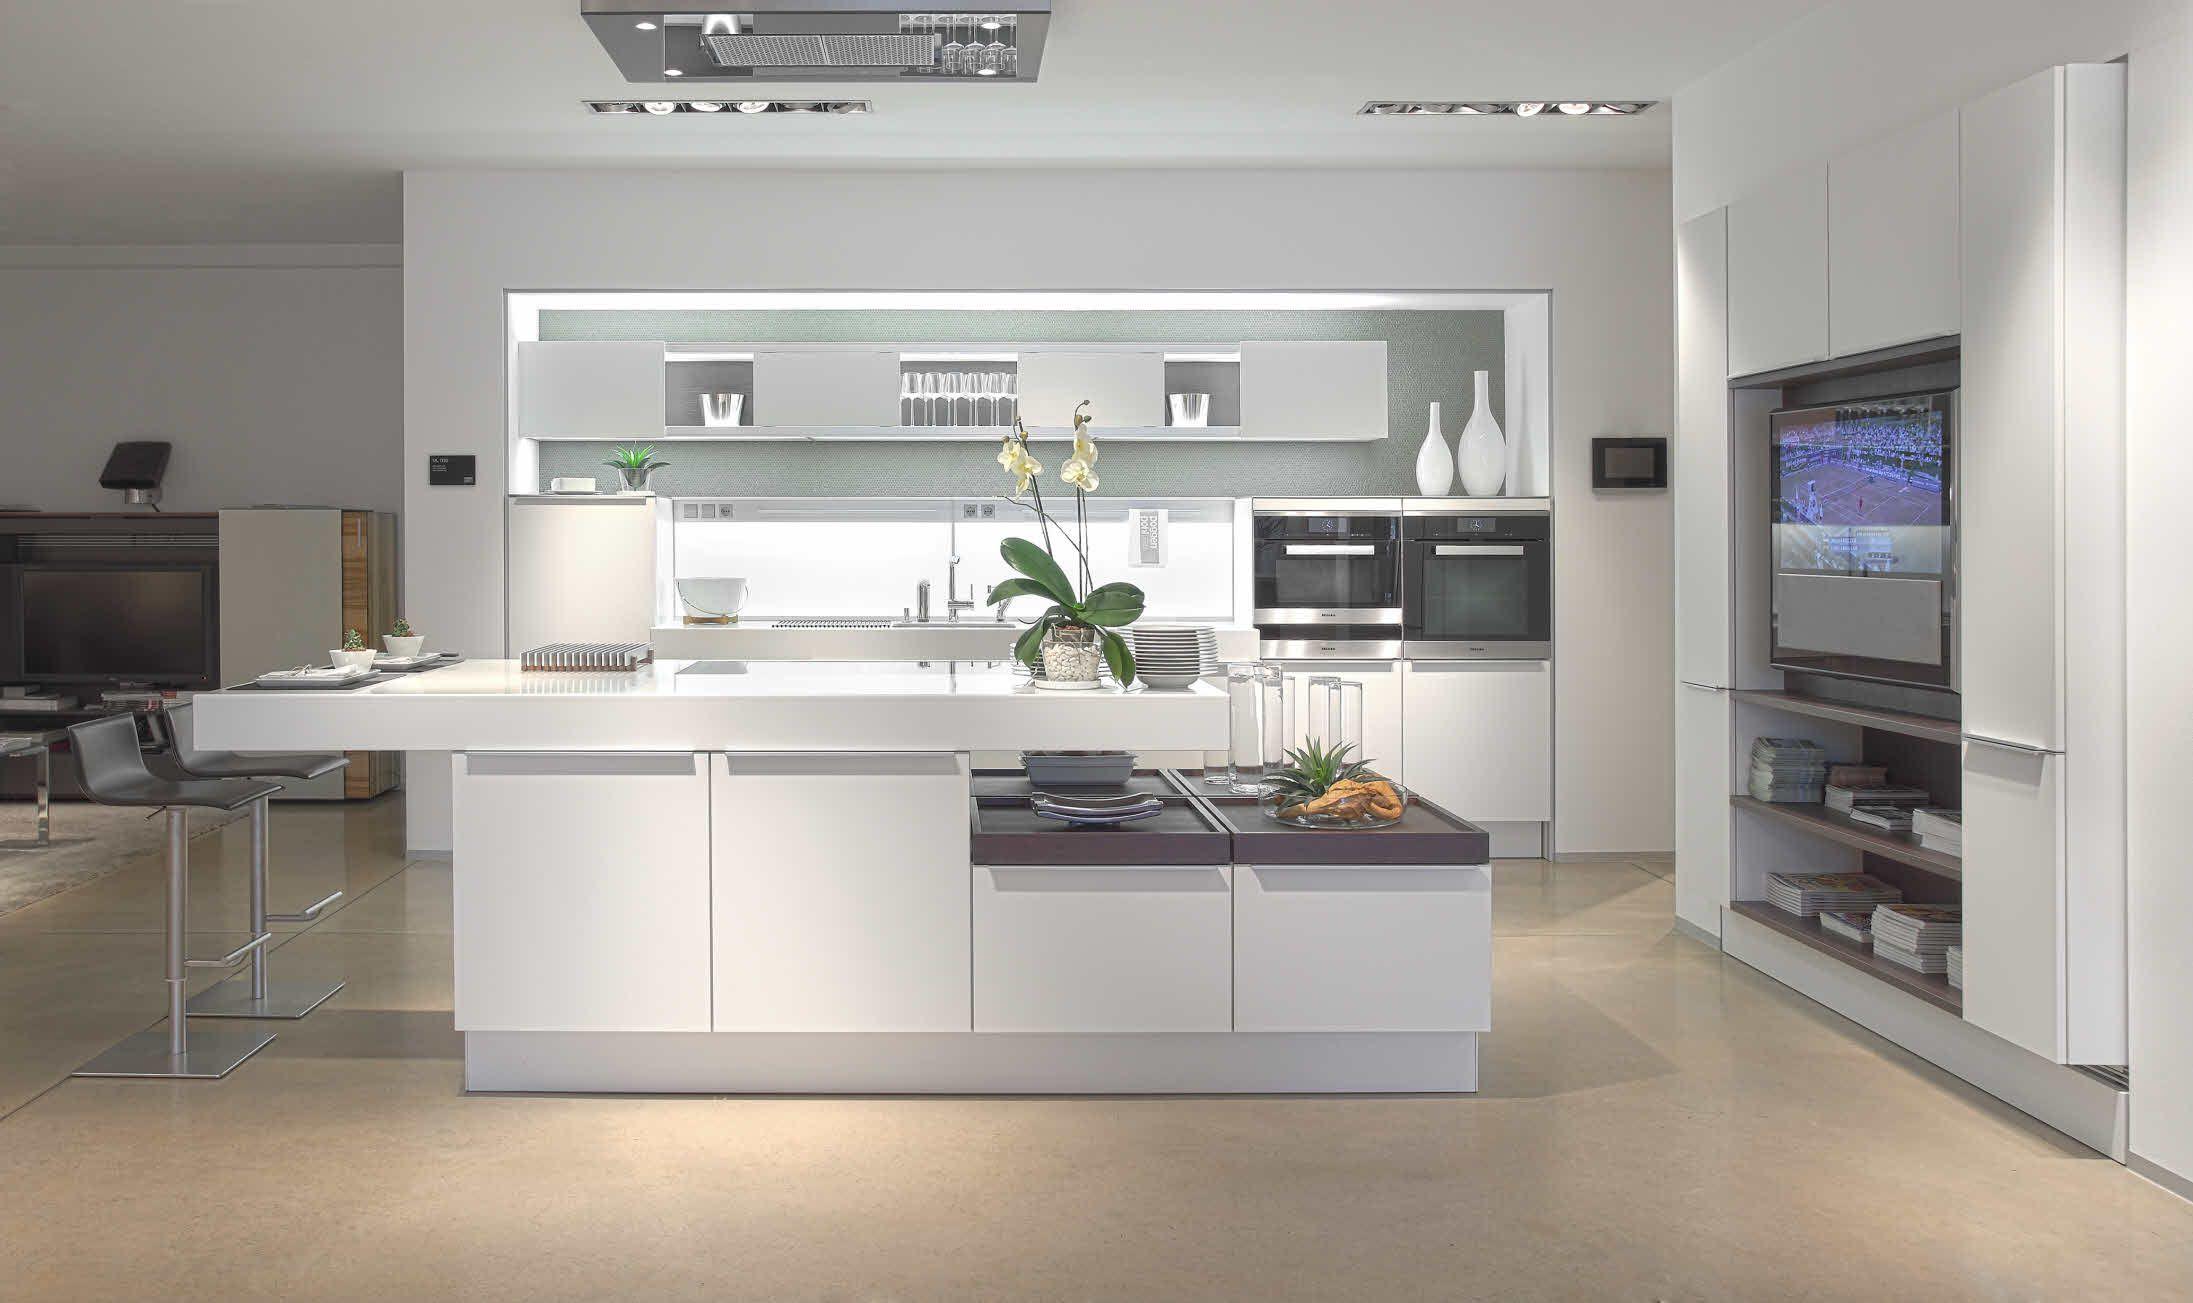 Poggenpohl Kuchenstudio Frankfurt Showroom White Modern Kitchen Modern Kitchen Design Modern White Kitchen Cabinets